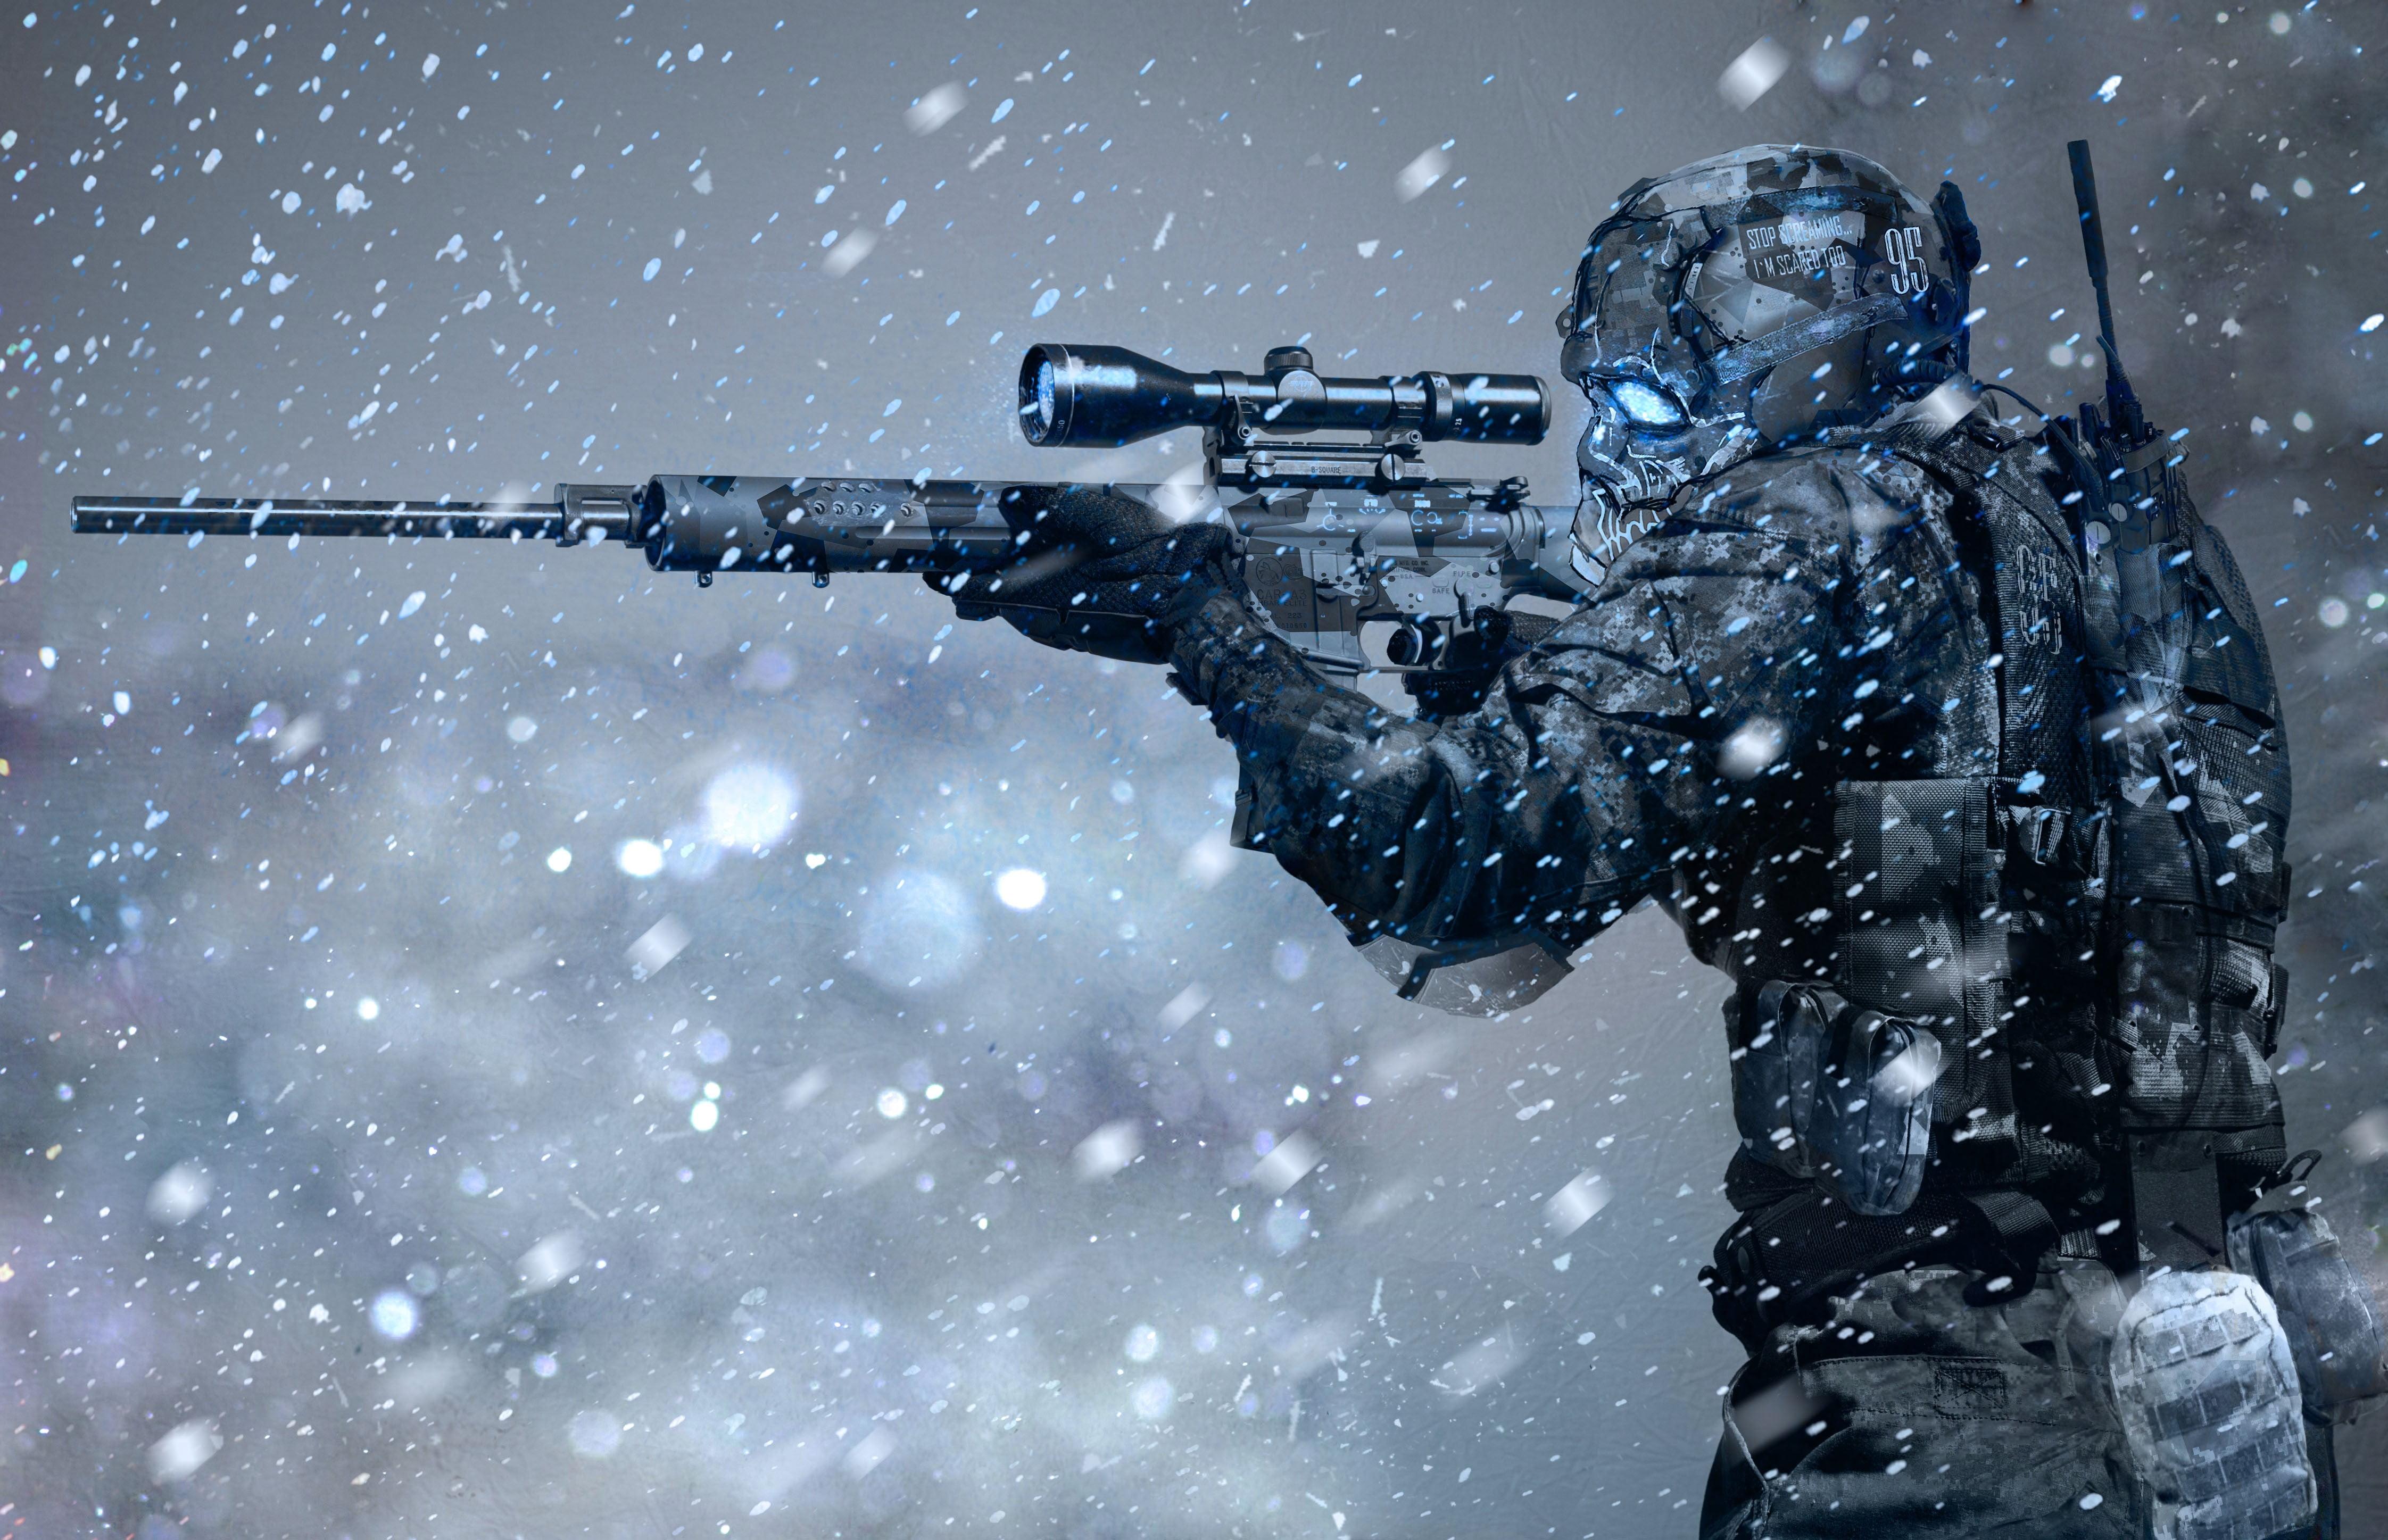 Man holding sniper rifle illustration HD wallpaper Wallpaper Flare 4488x2895